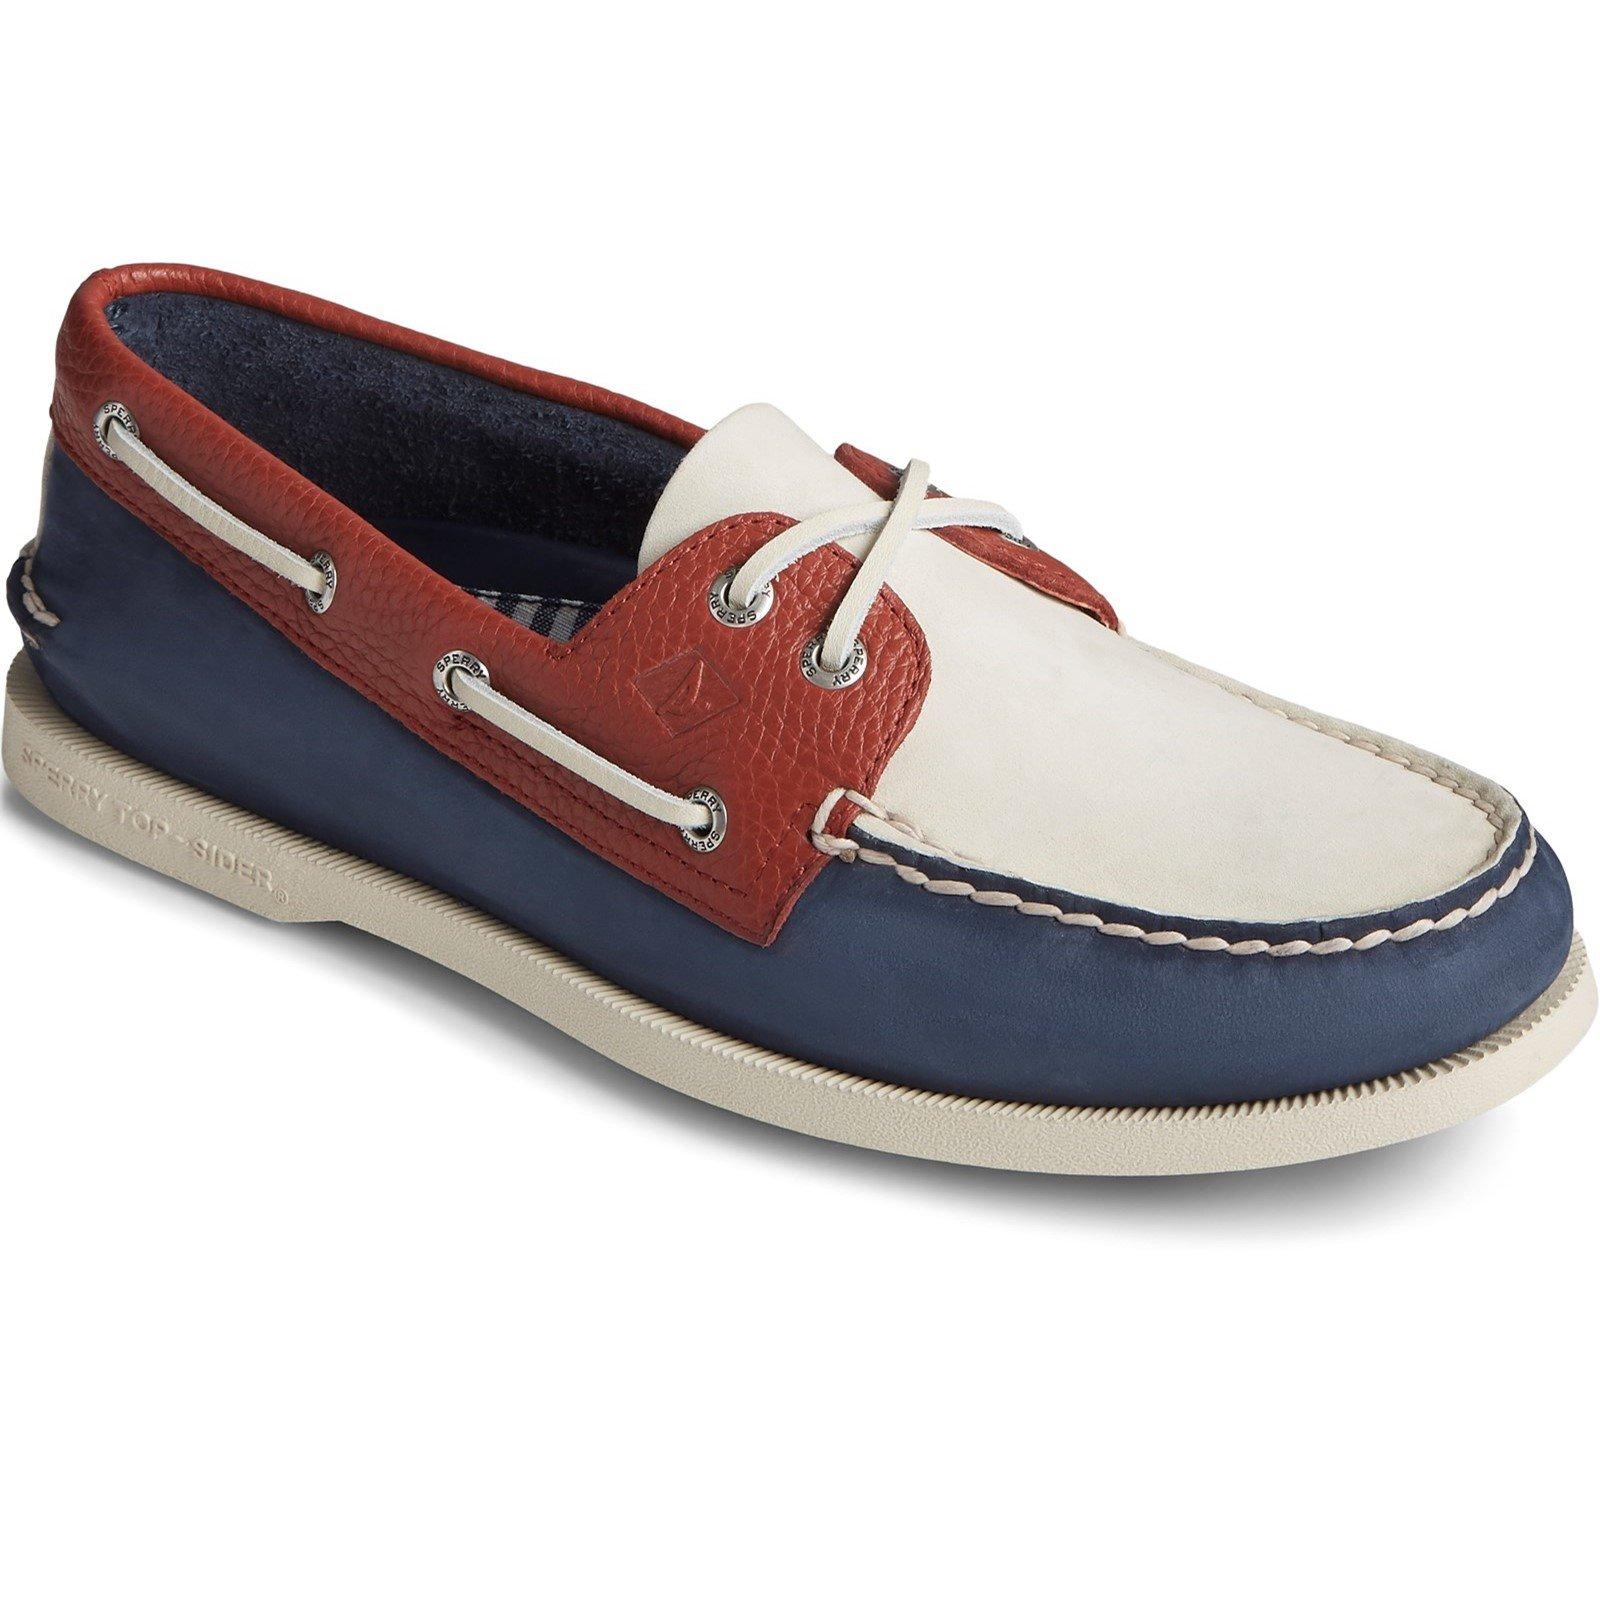 Sperry Men's A/O 2-Eye Nubuck Boat Shoe Various Colours 32920 - Blue/White 12